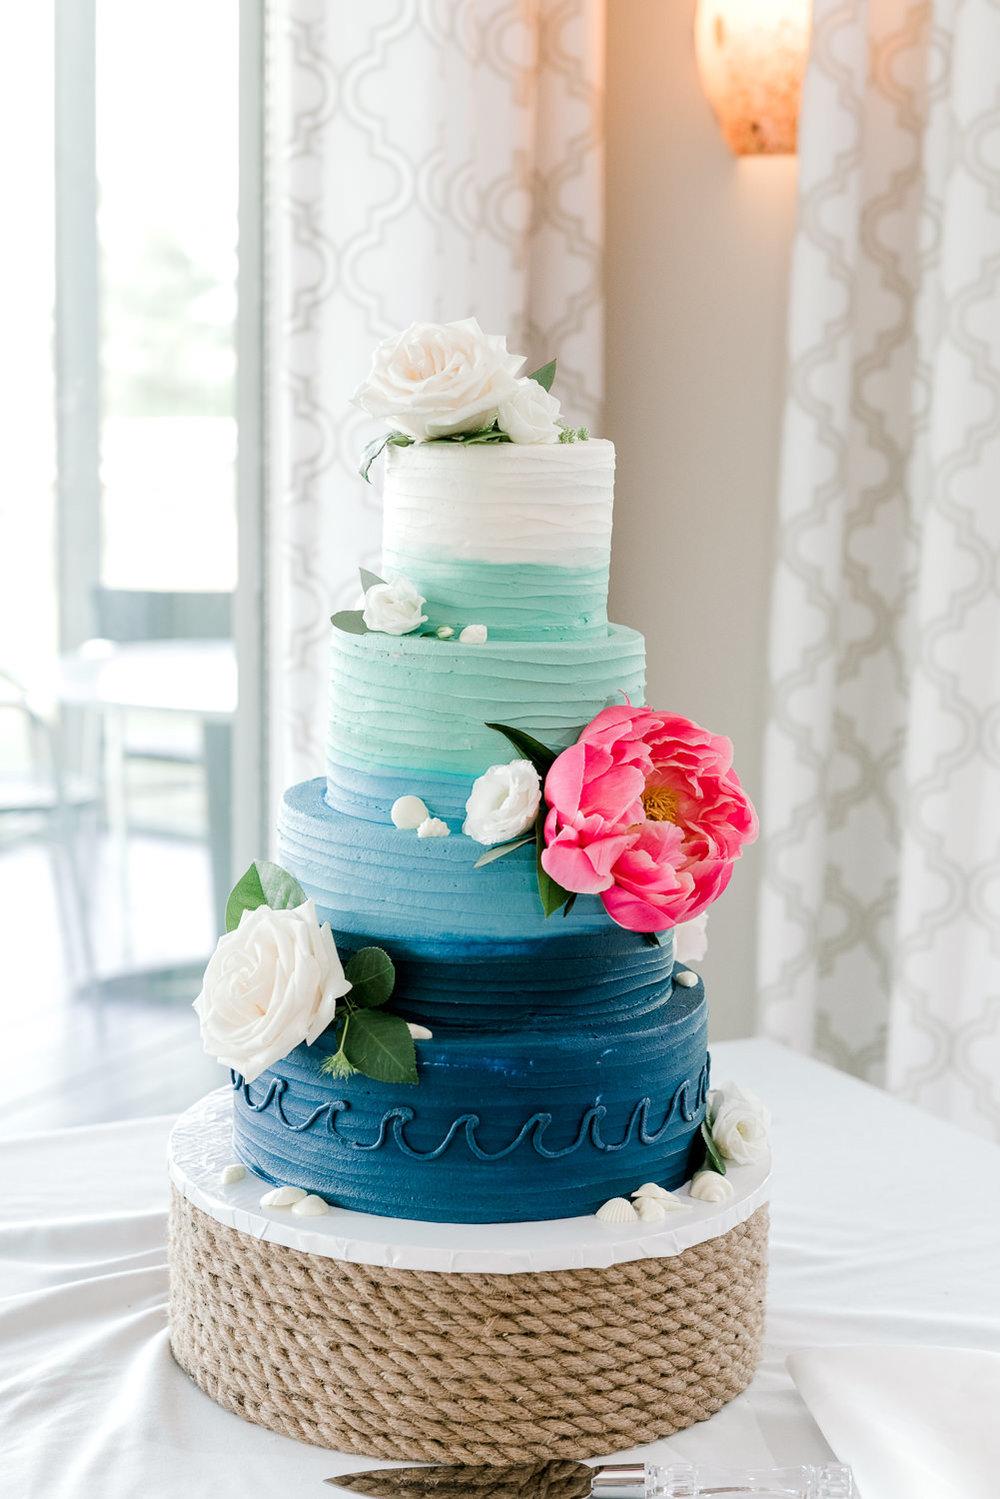 Wicked Sweet Sugar Boutique Maine Wedding Cake